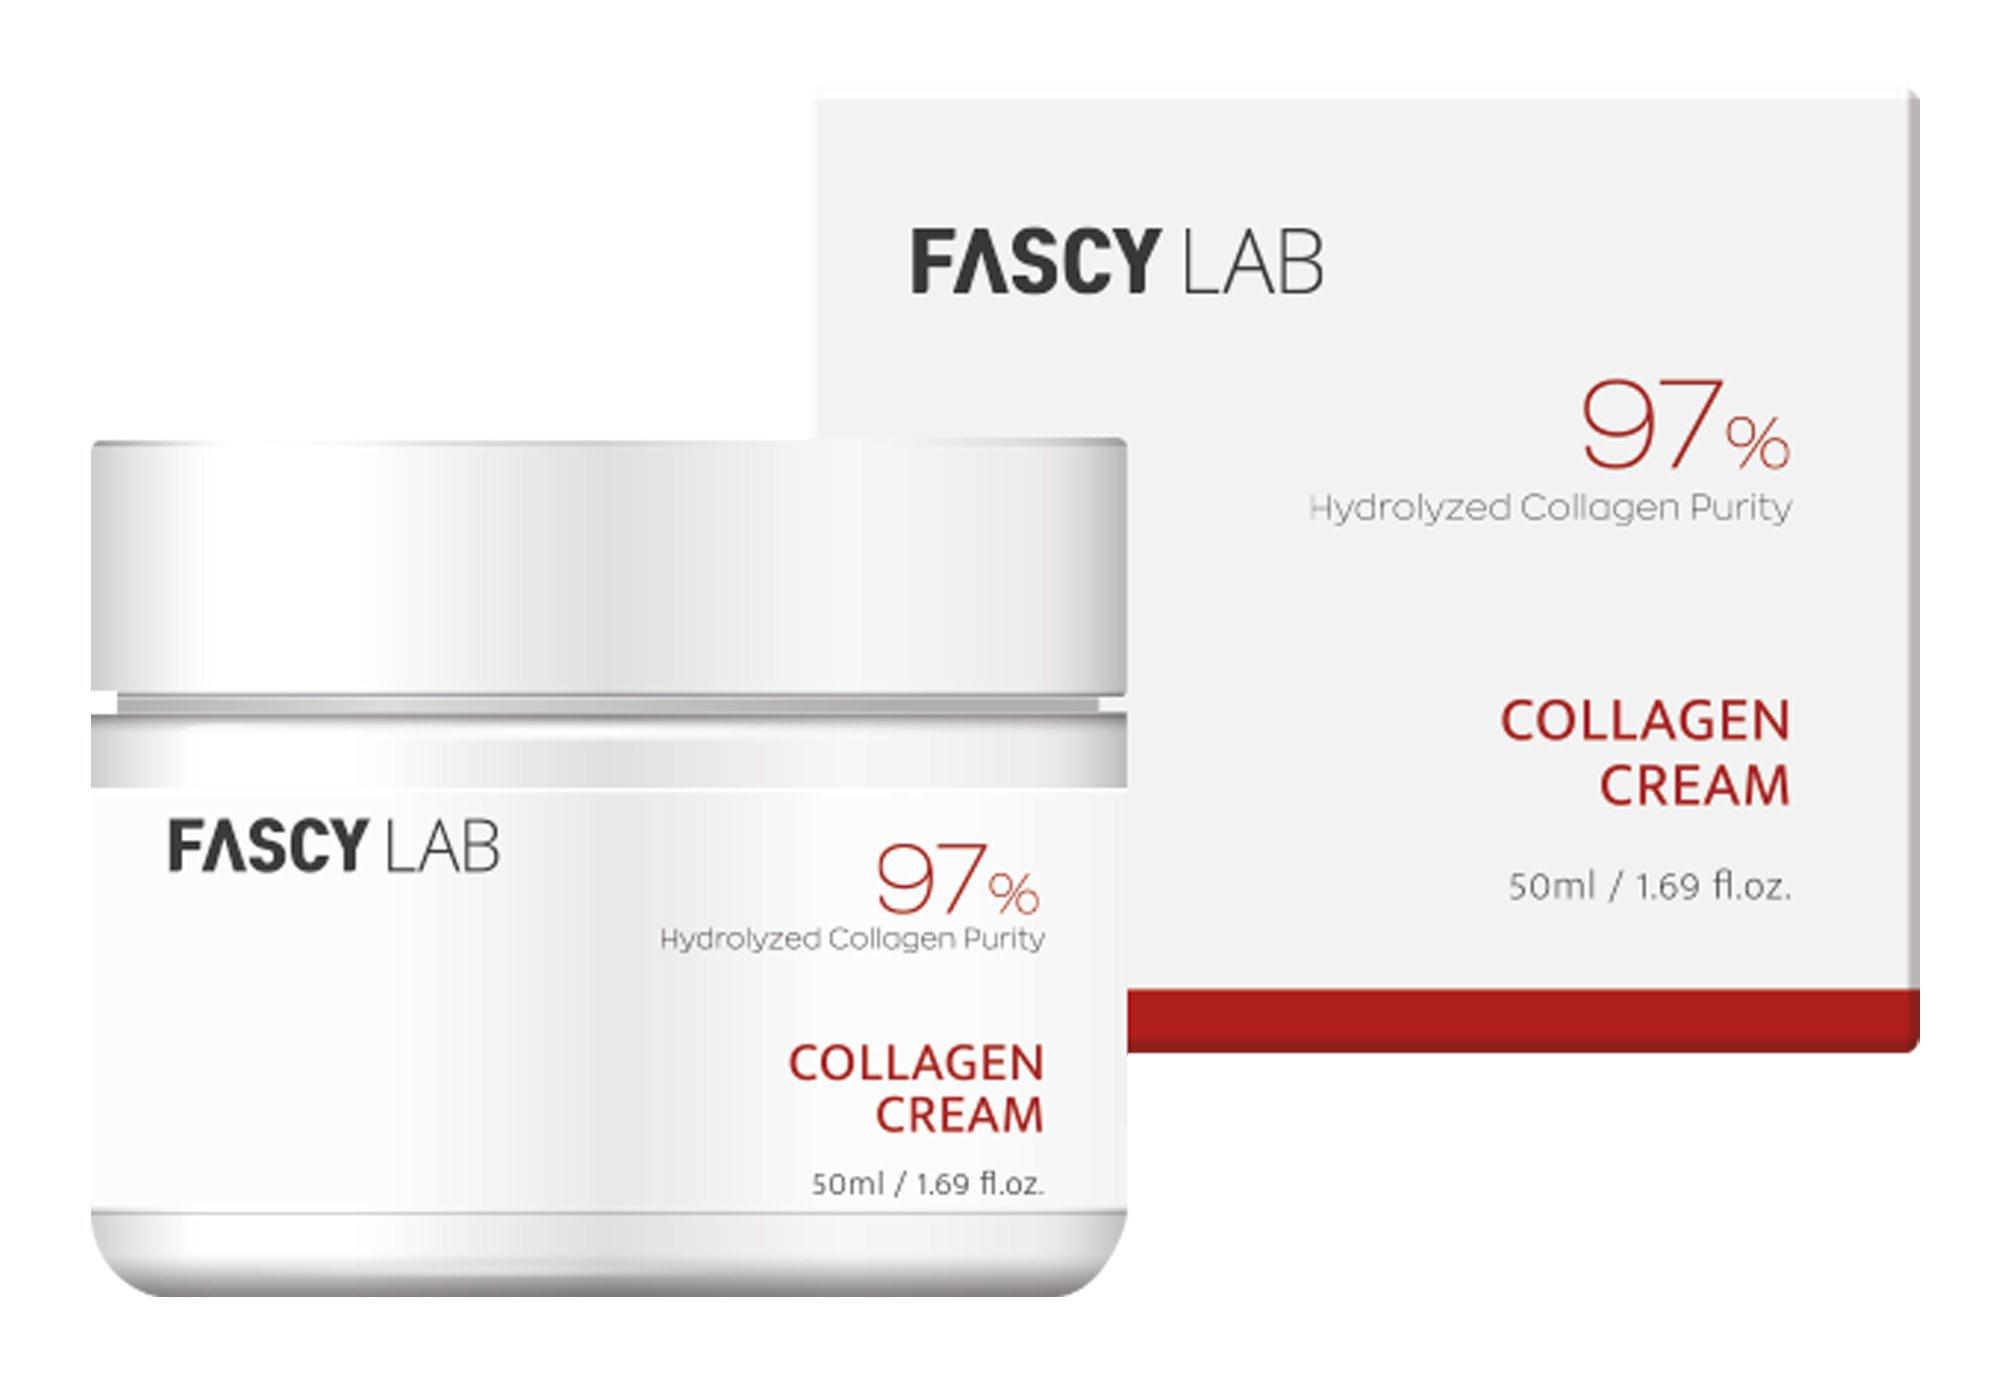 FASCY LAB Collagen Cream